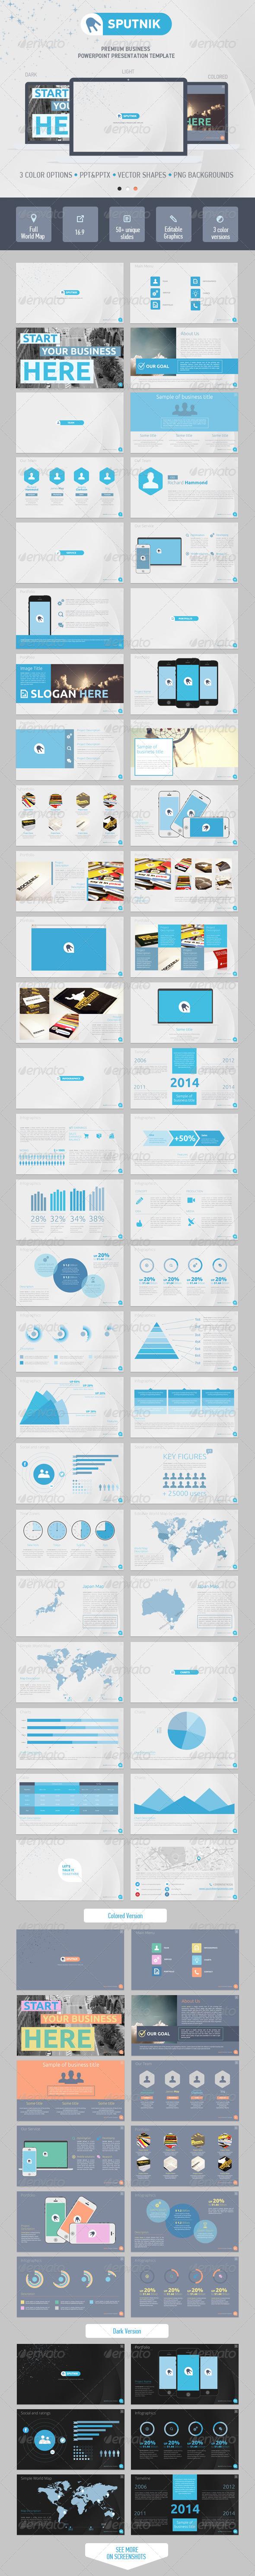 GraphicRiver Sputnik PowerPoint Presentation Template 6849783